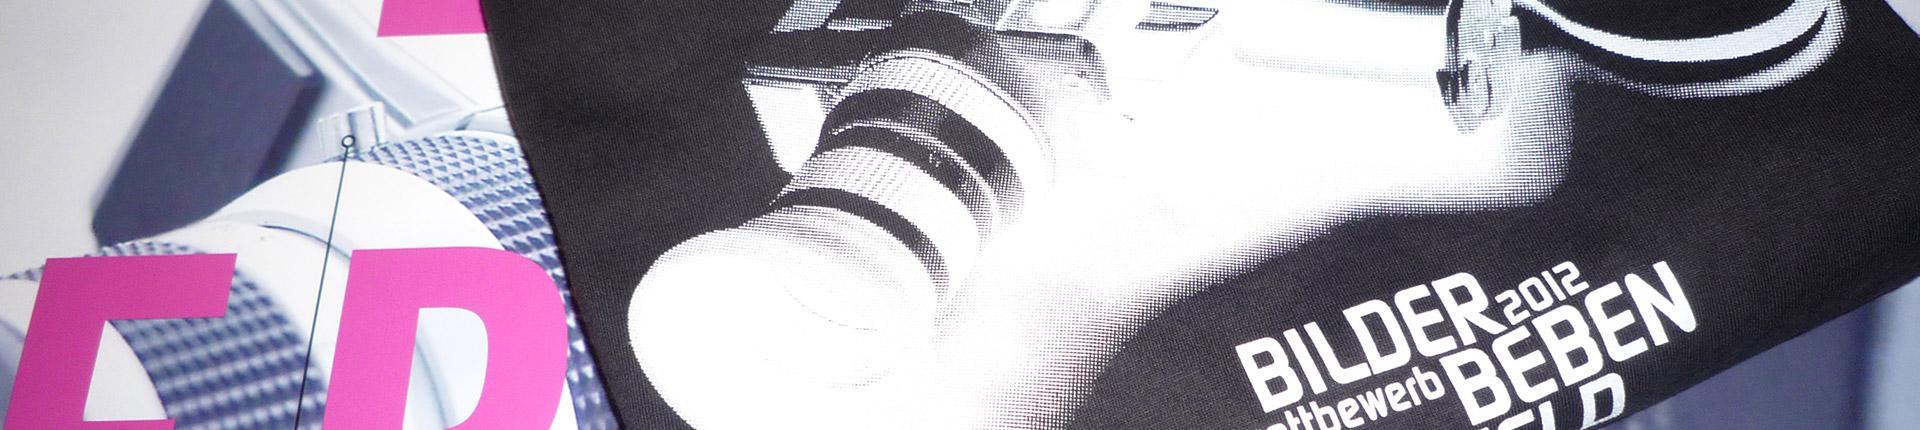 Kurzfilmwettbewerb Bilderbeben 2012